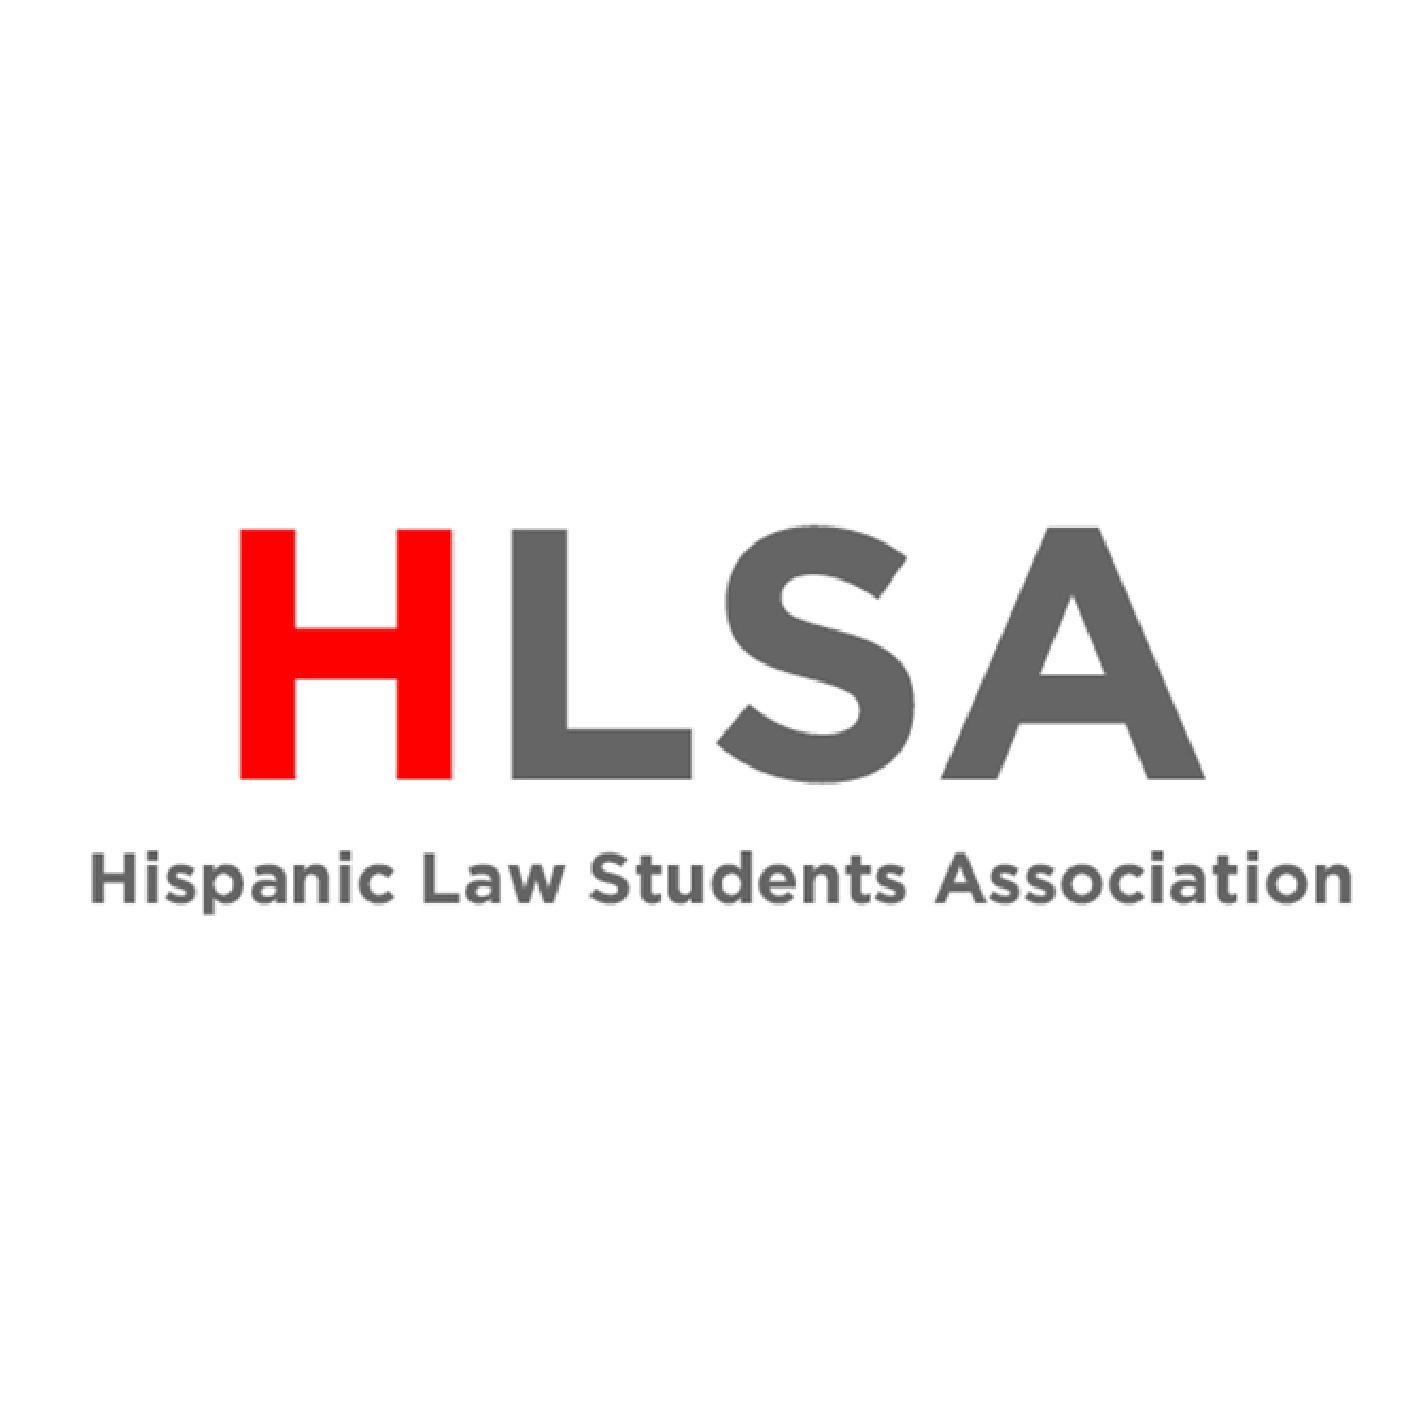 Hispanic Law Students Association, San Antonio, Texas